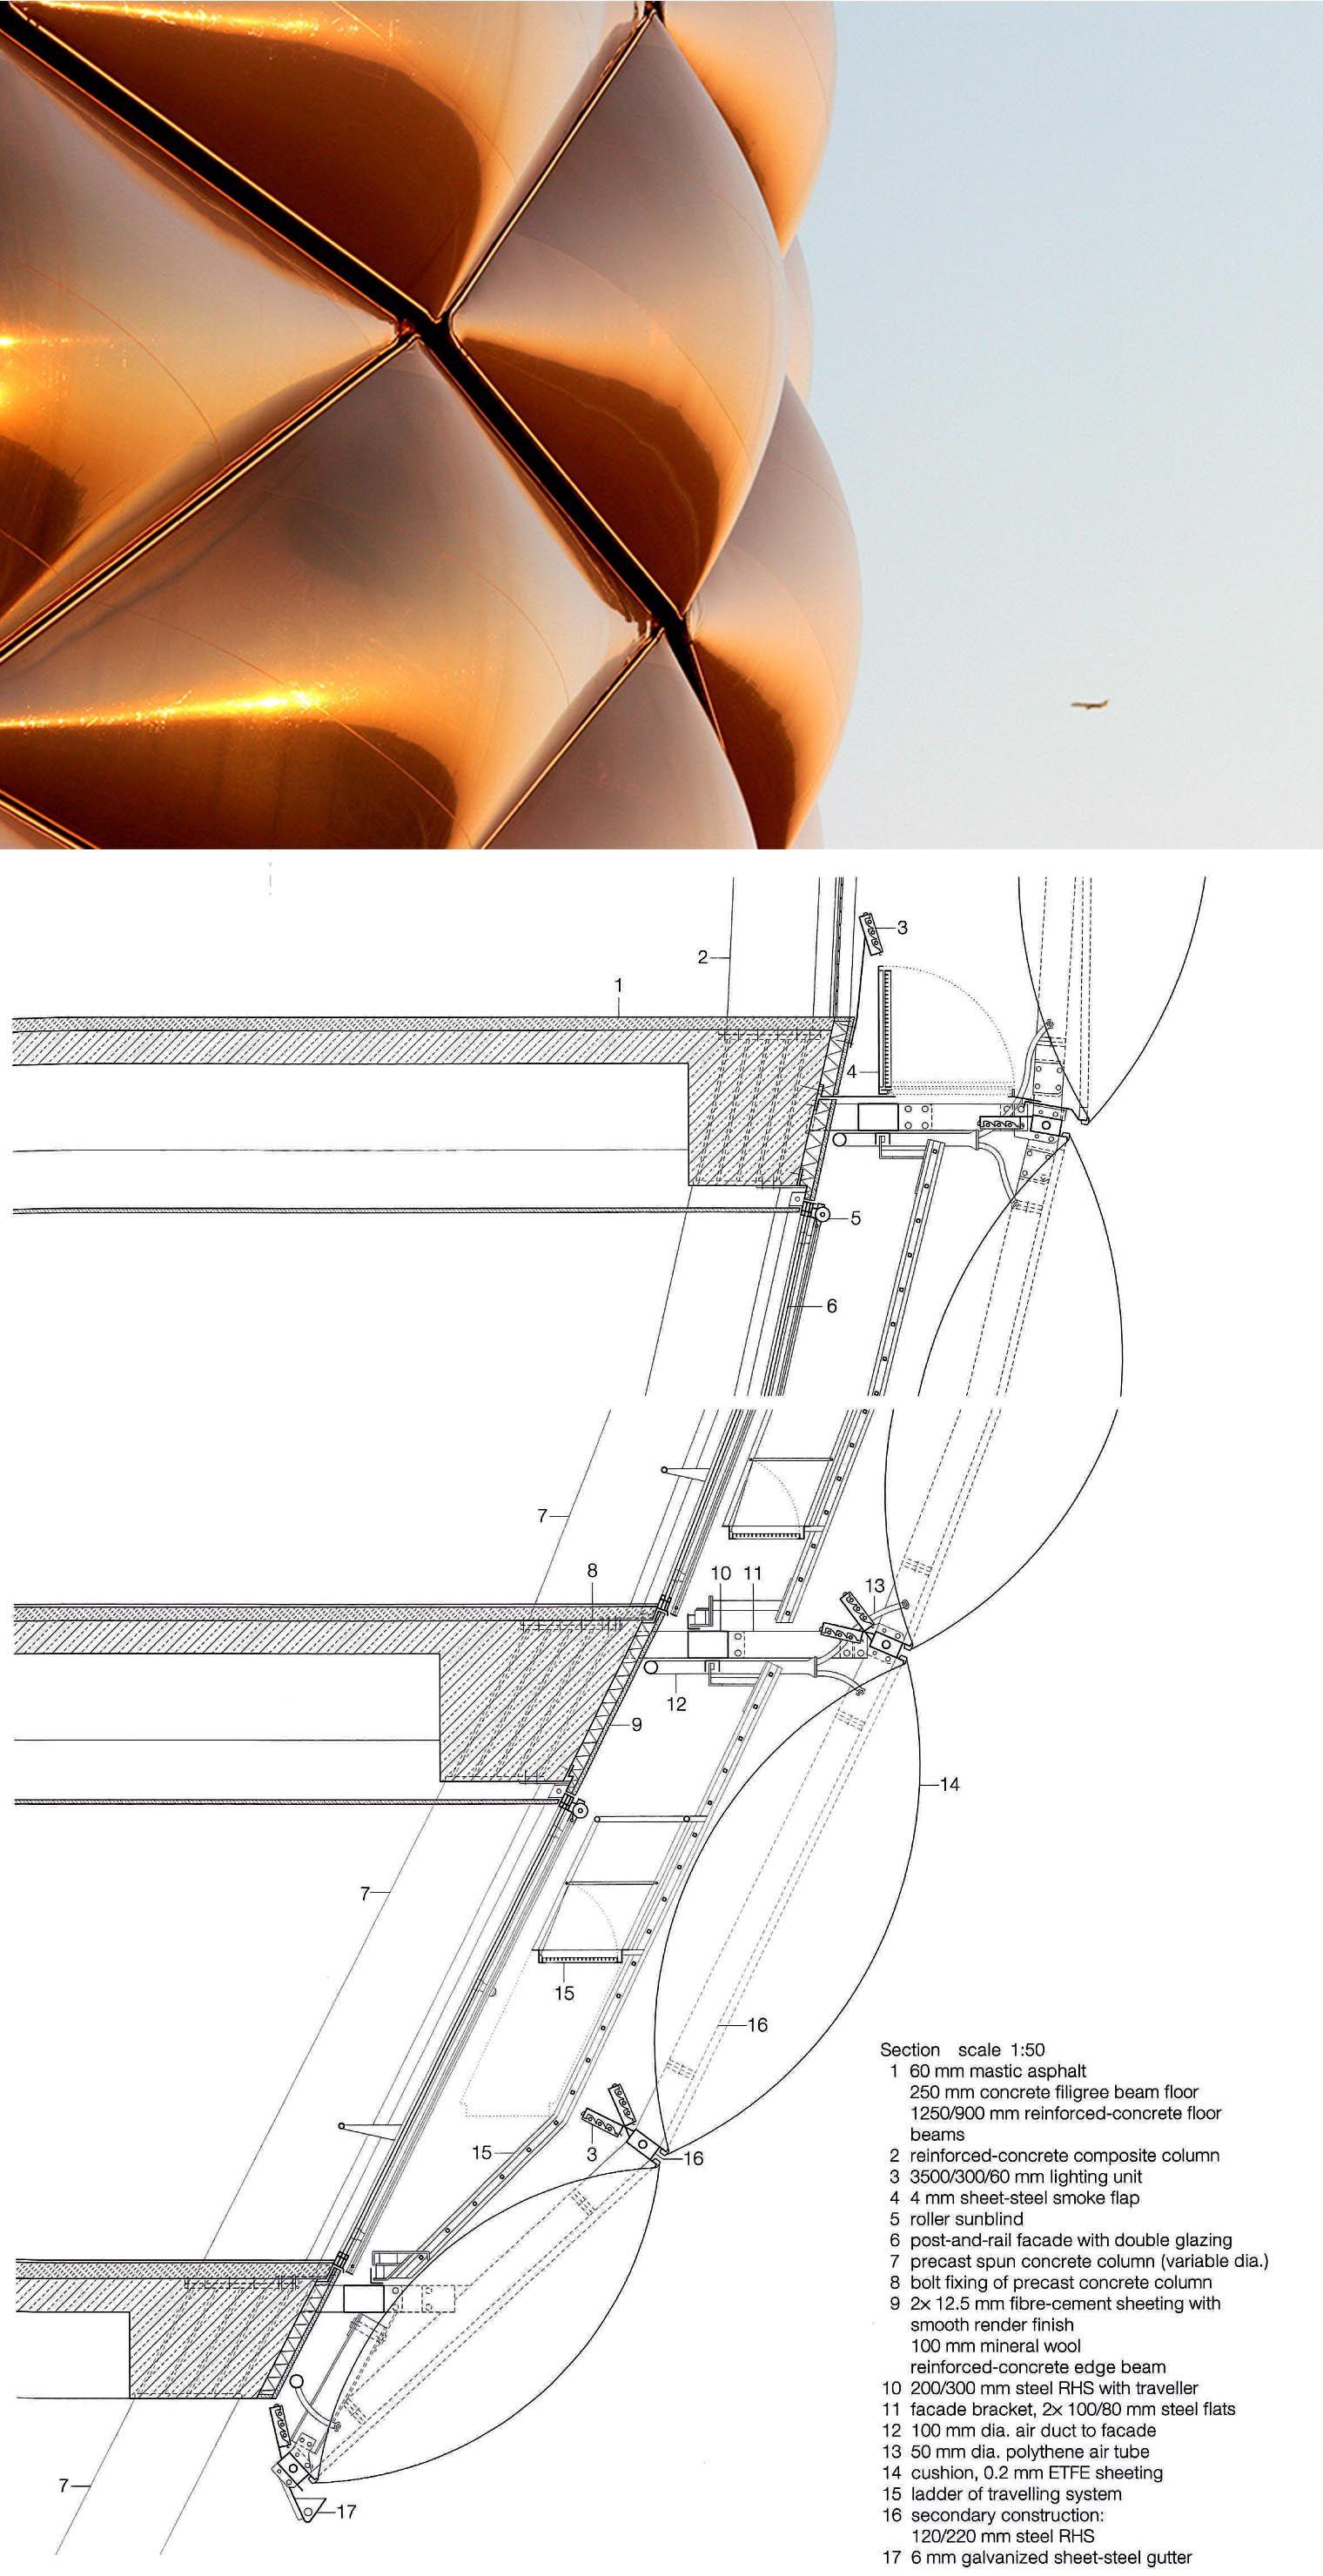 Porters five forces model of nokia ppt presentation